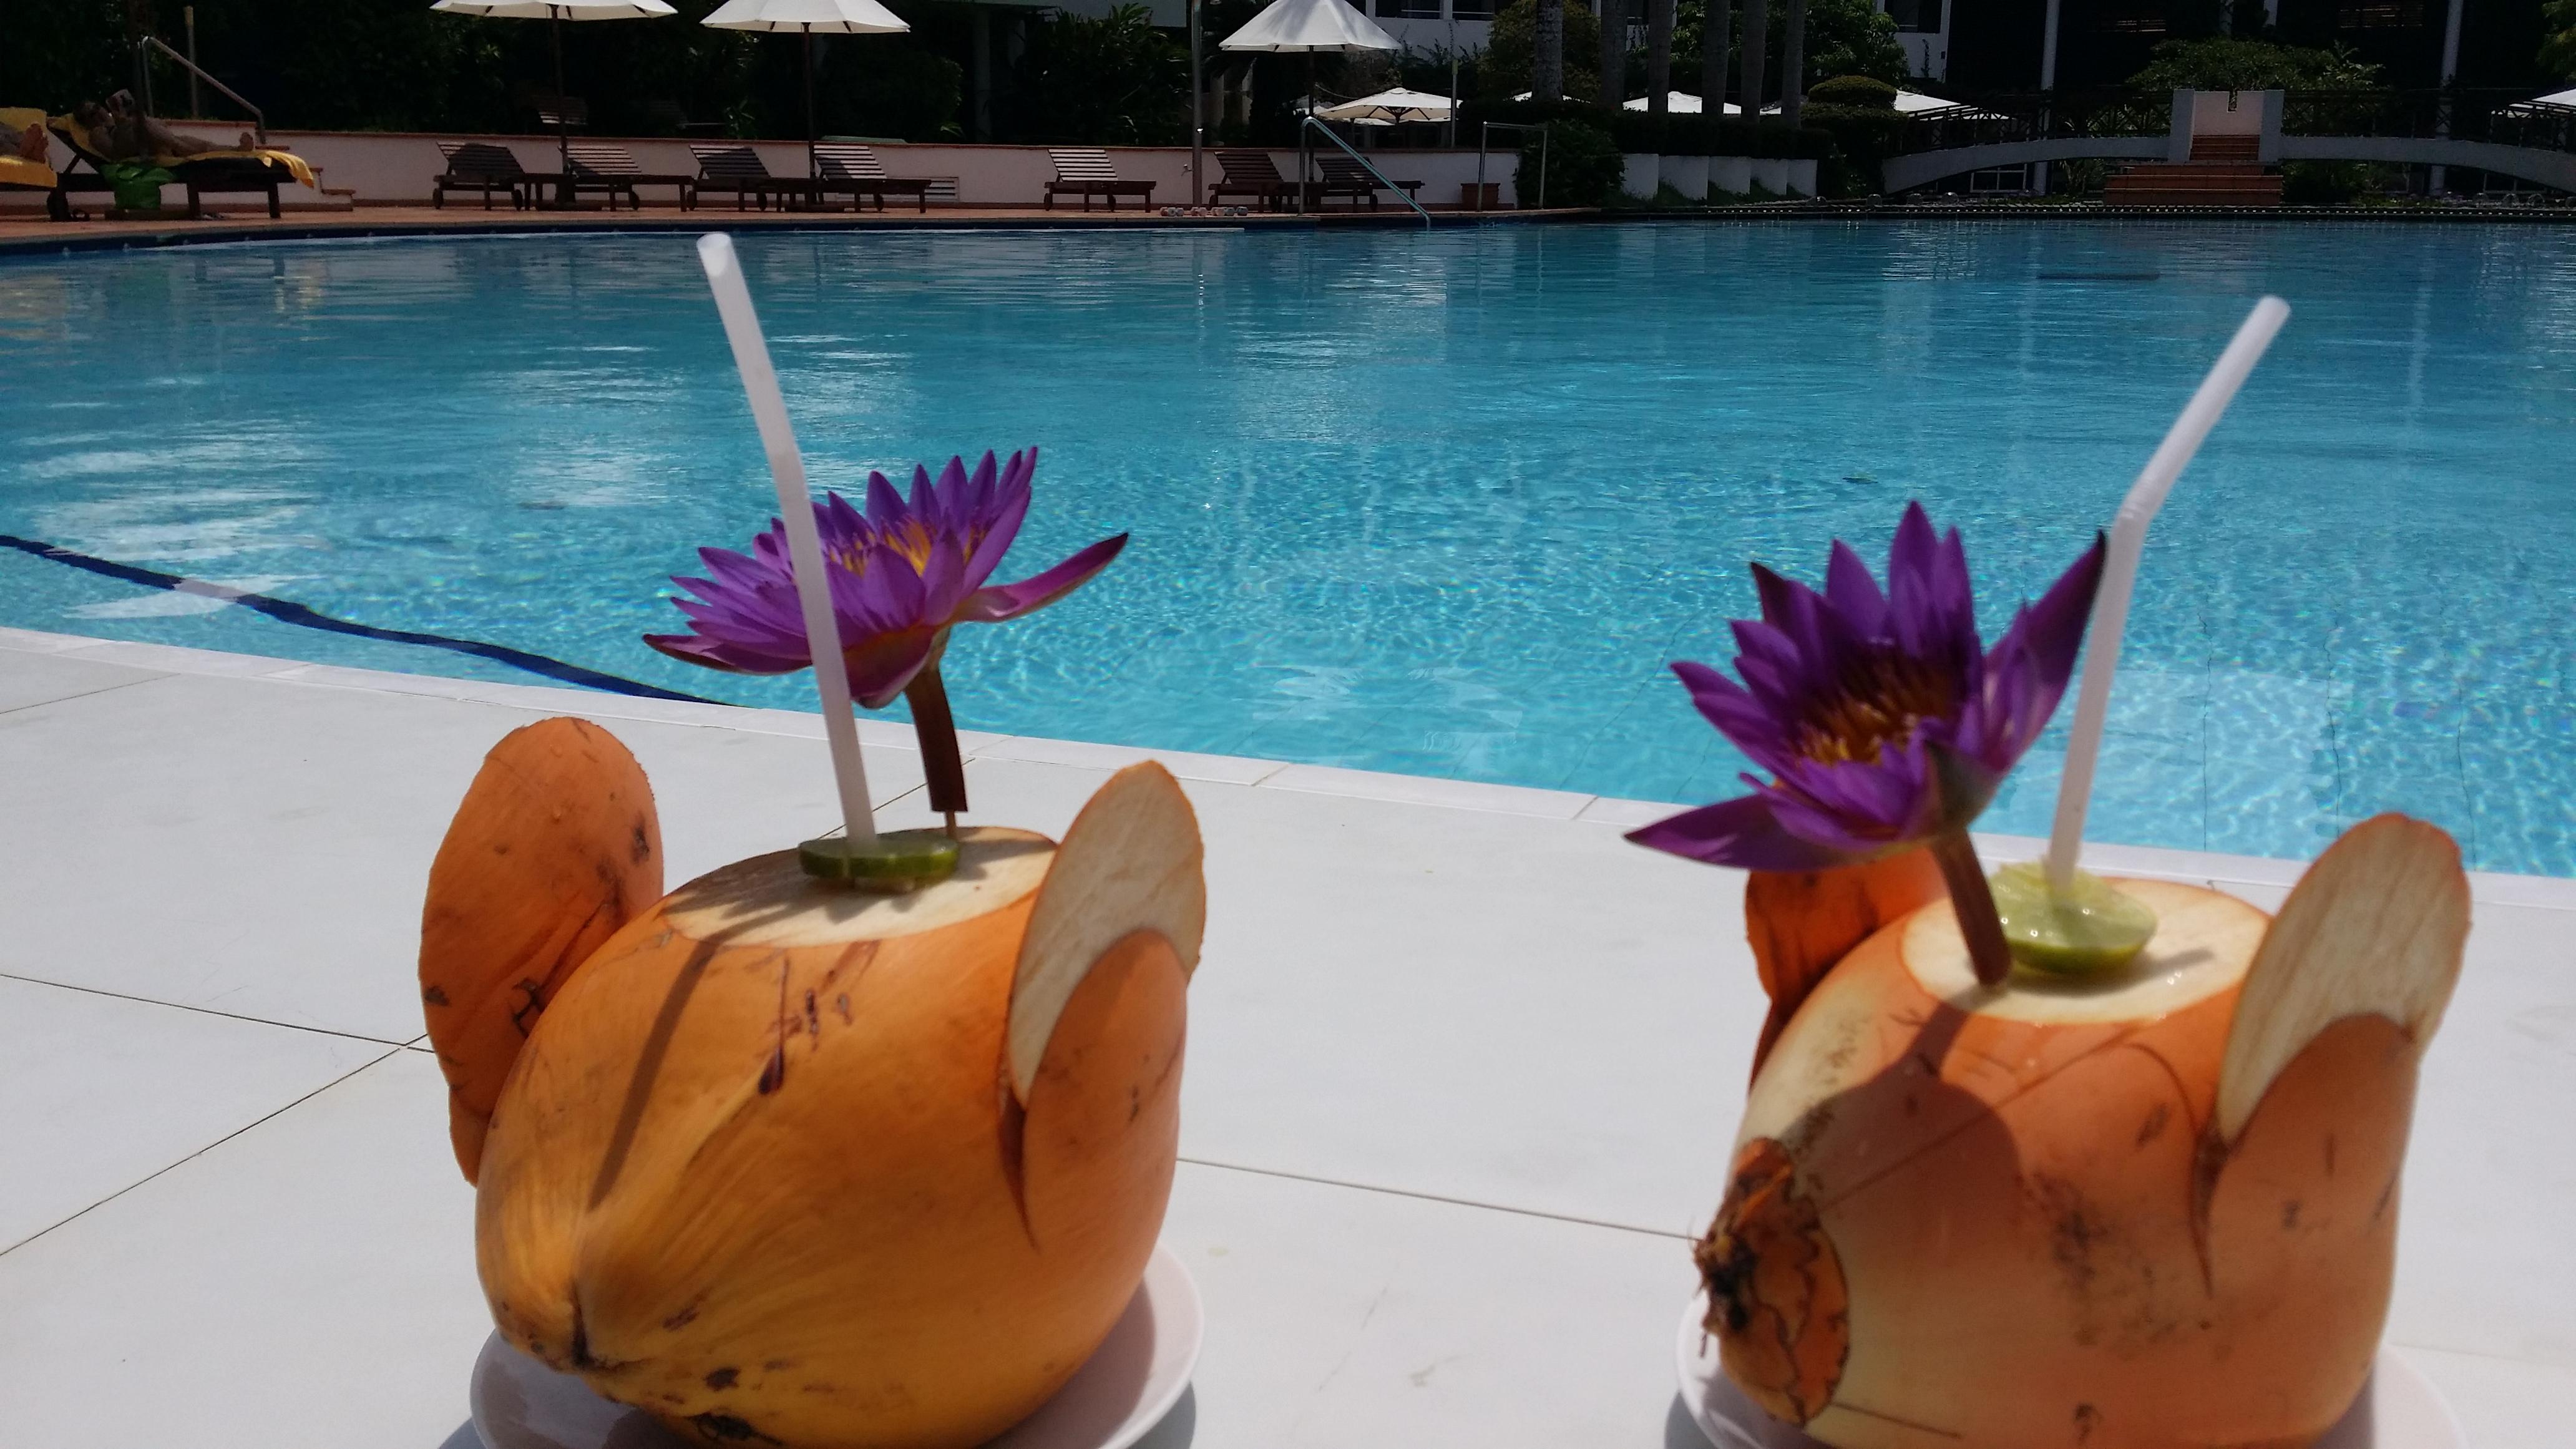 Getraenke am Hotel Pool im Ayurveda Hotel Lanka Princess